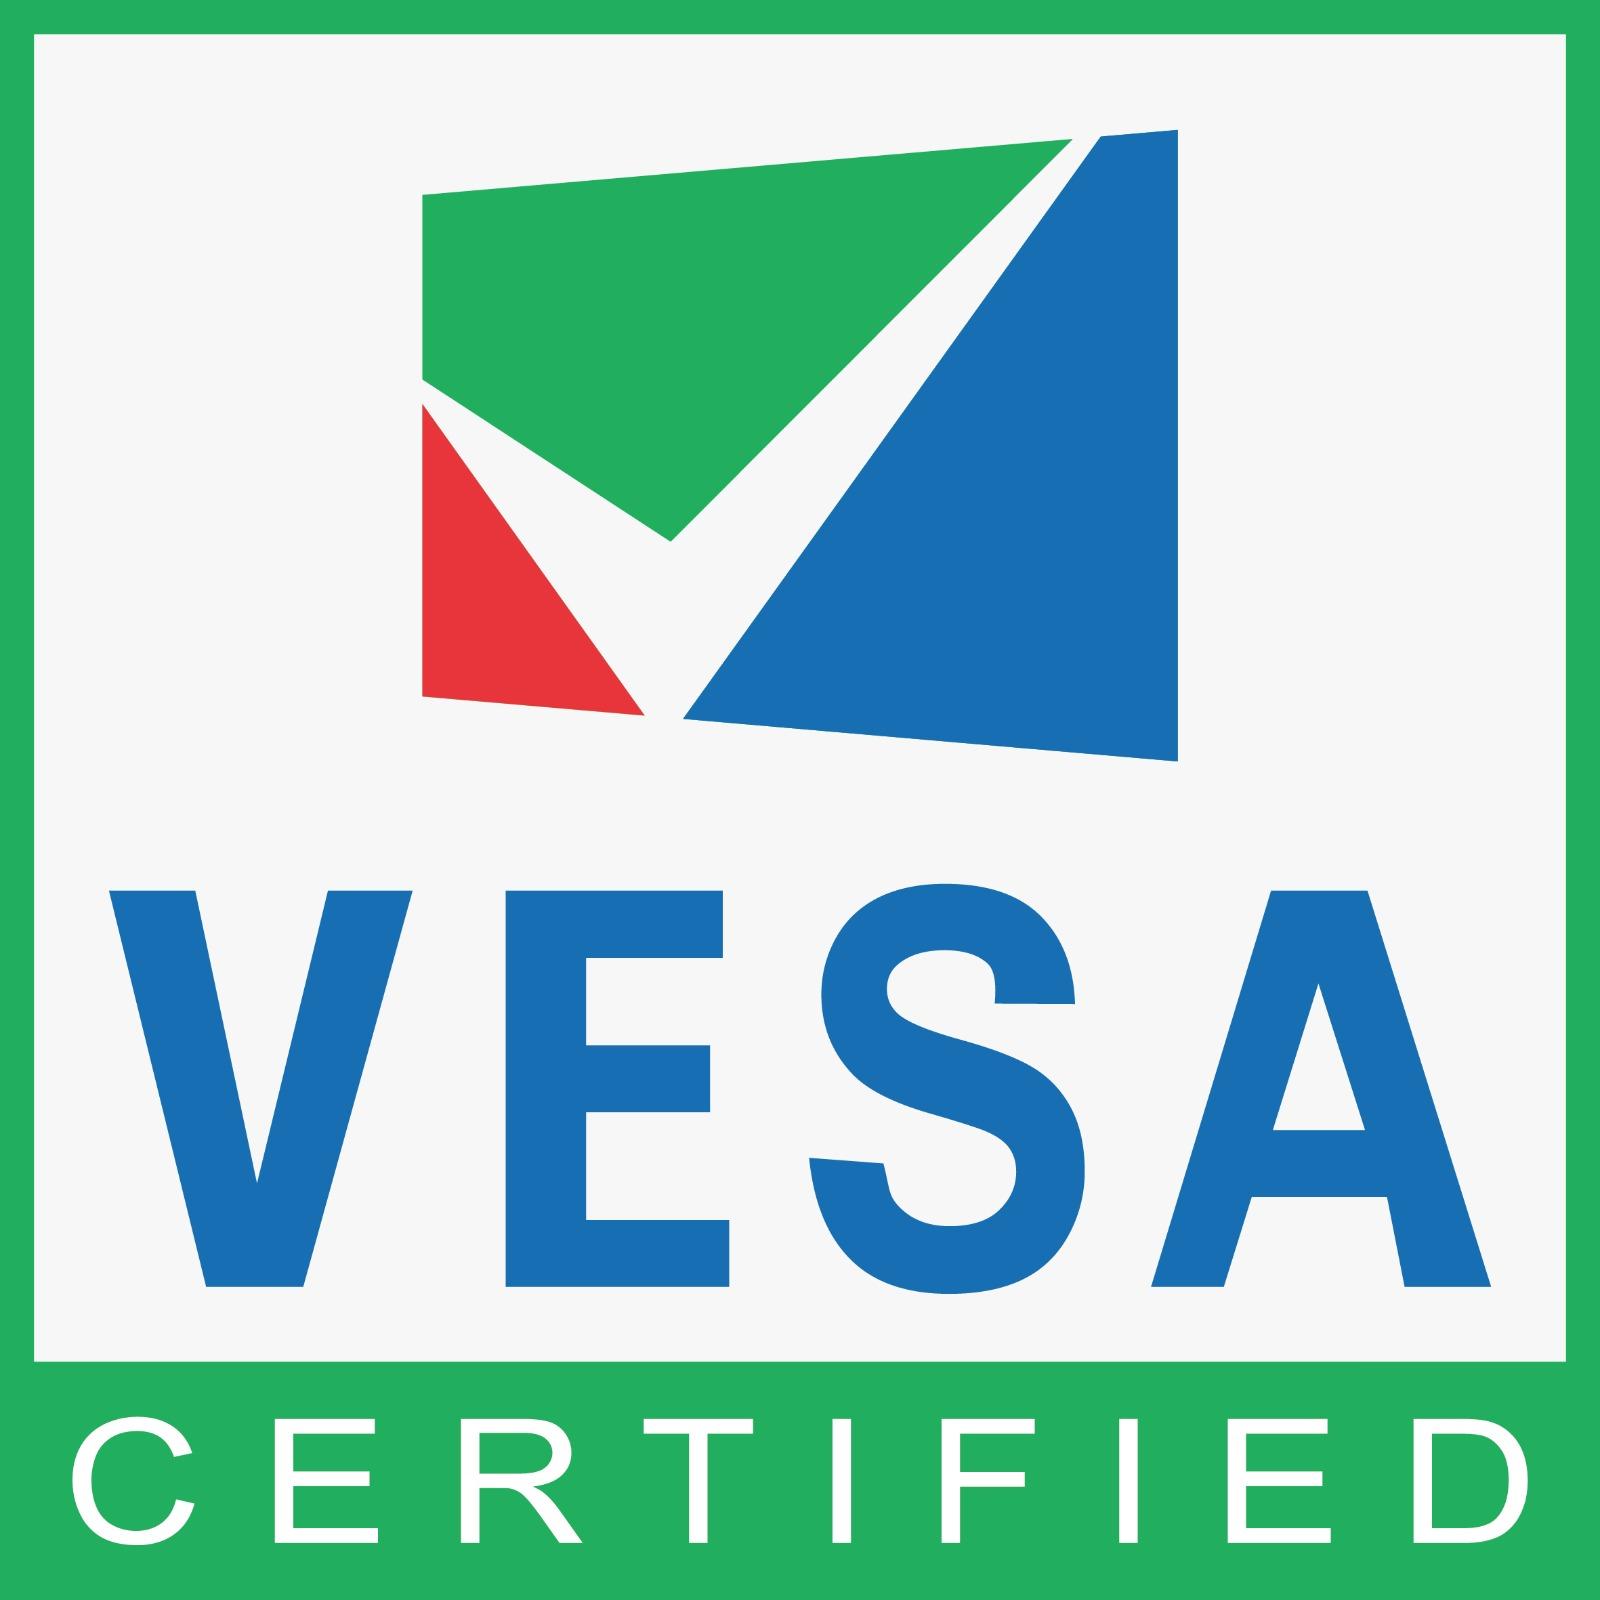 VESA_Certified